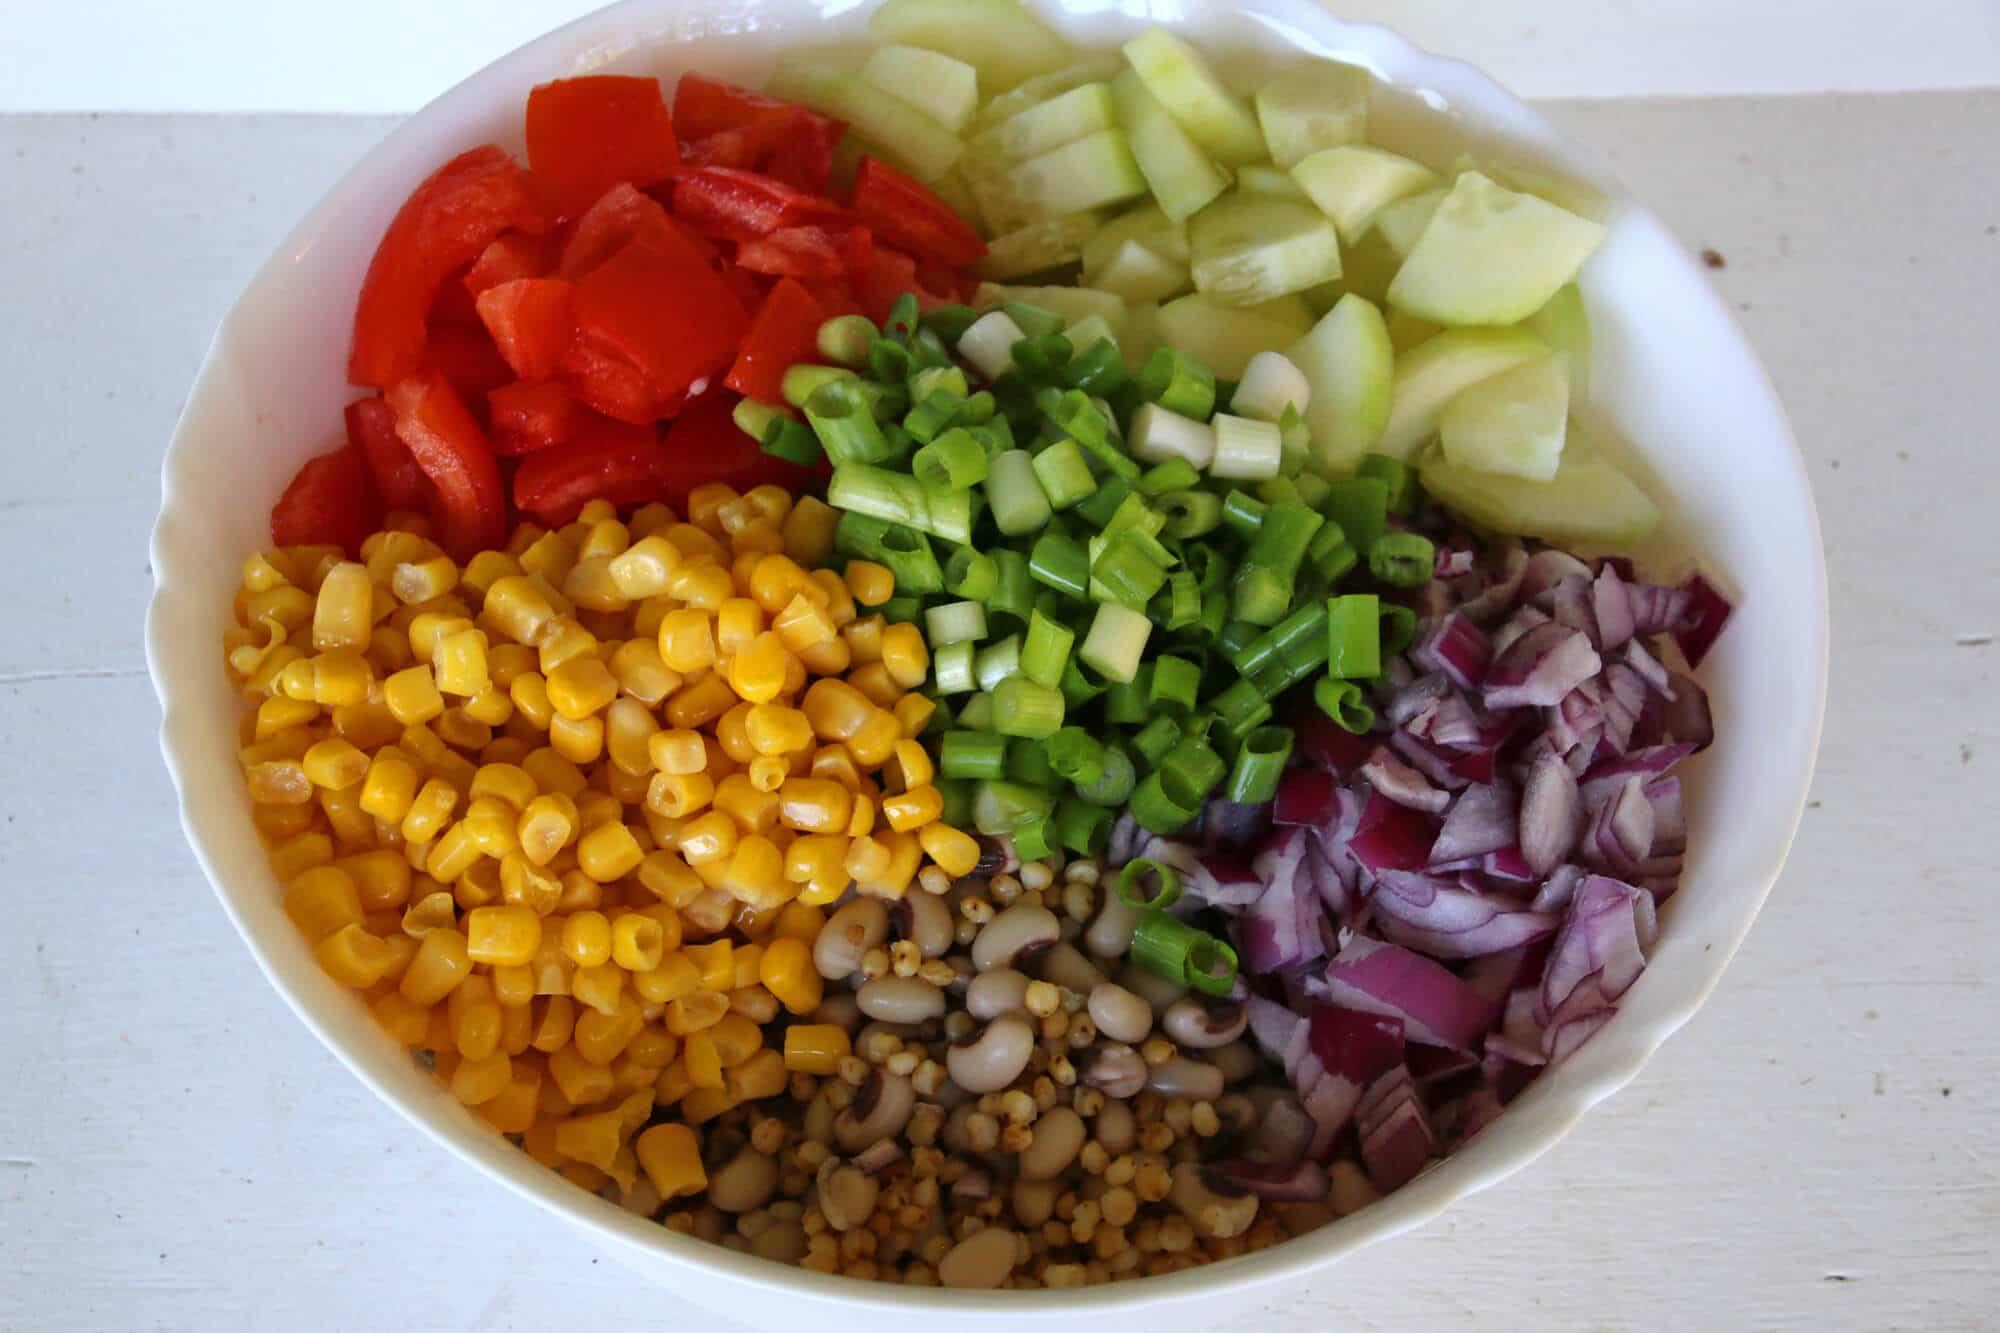 sorghum grain salad black eyed peas southern recipe healthy vegetables vinaigrette dressing smoked paprika cucumbers tomatoes corn